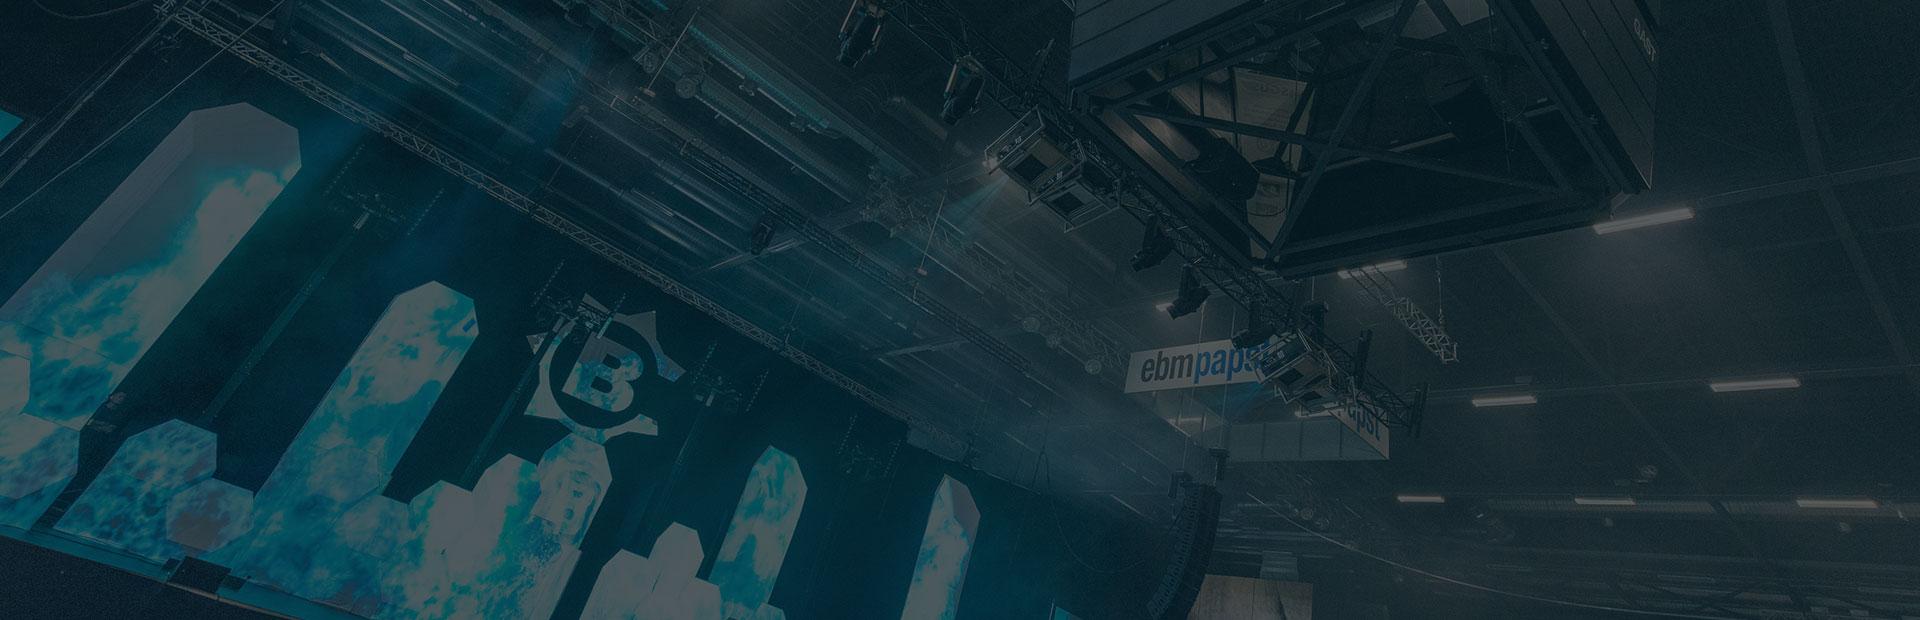 Helios Arena Events - Headerbereich